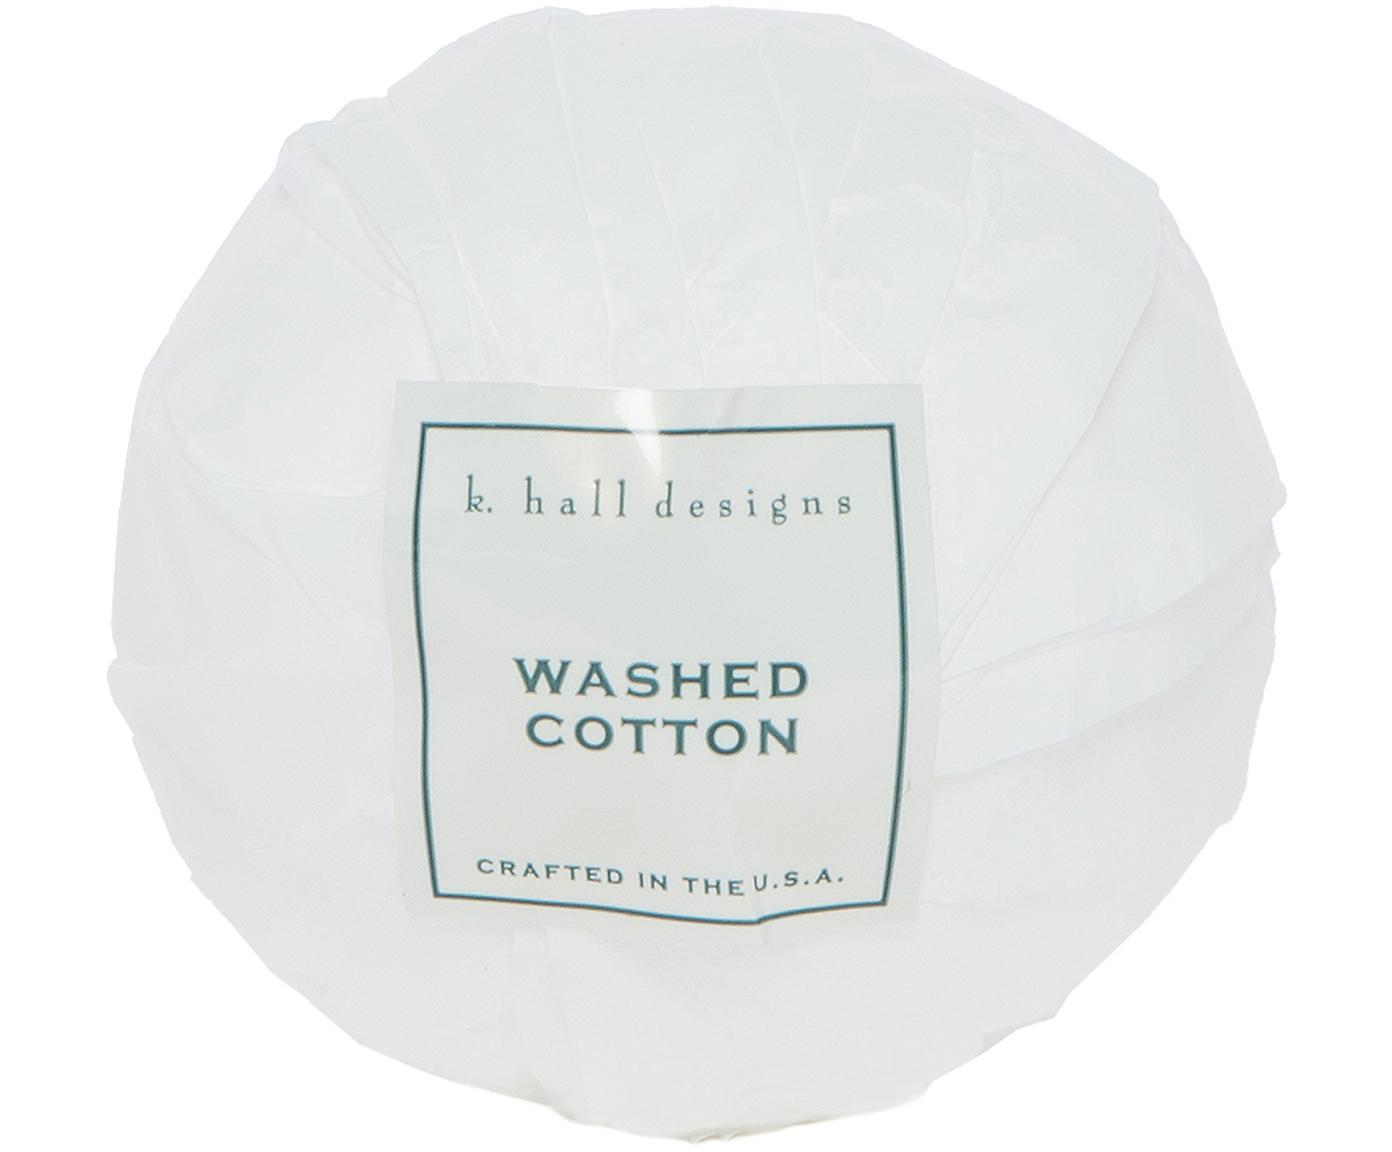 Badekugel Washed Cotton (Lavendel & Kamille), Weiß, Ø 7 x H 7 cm